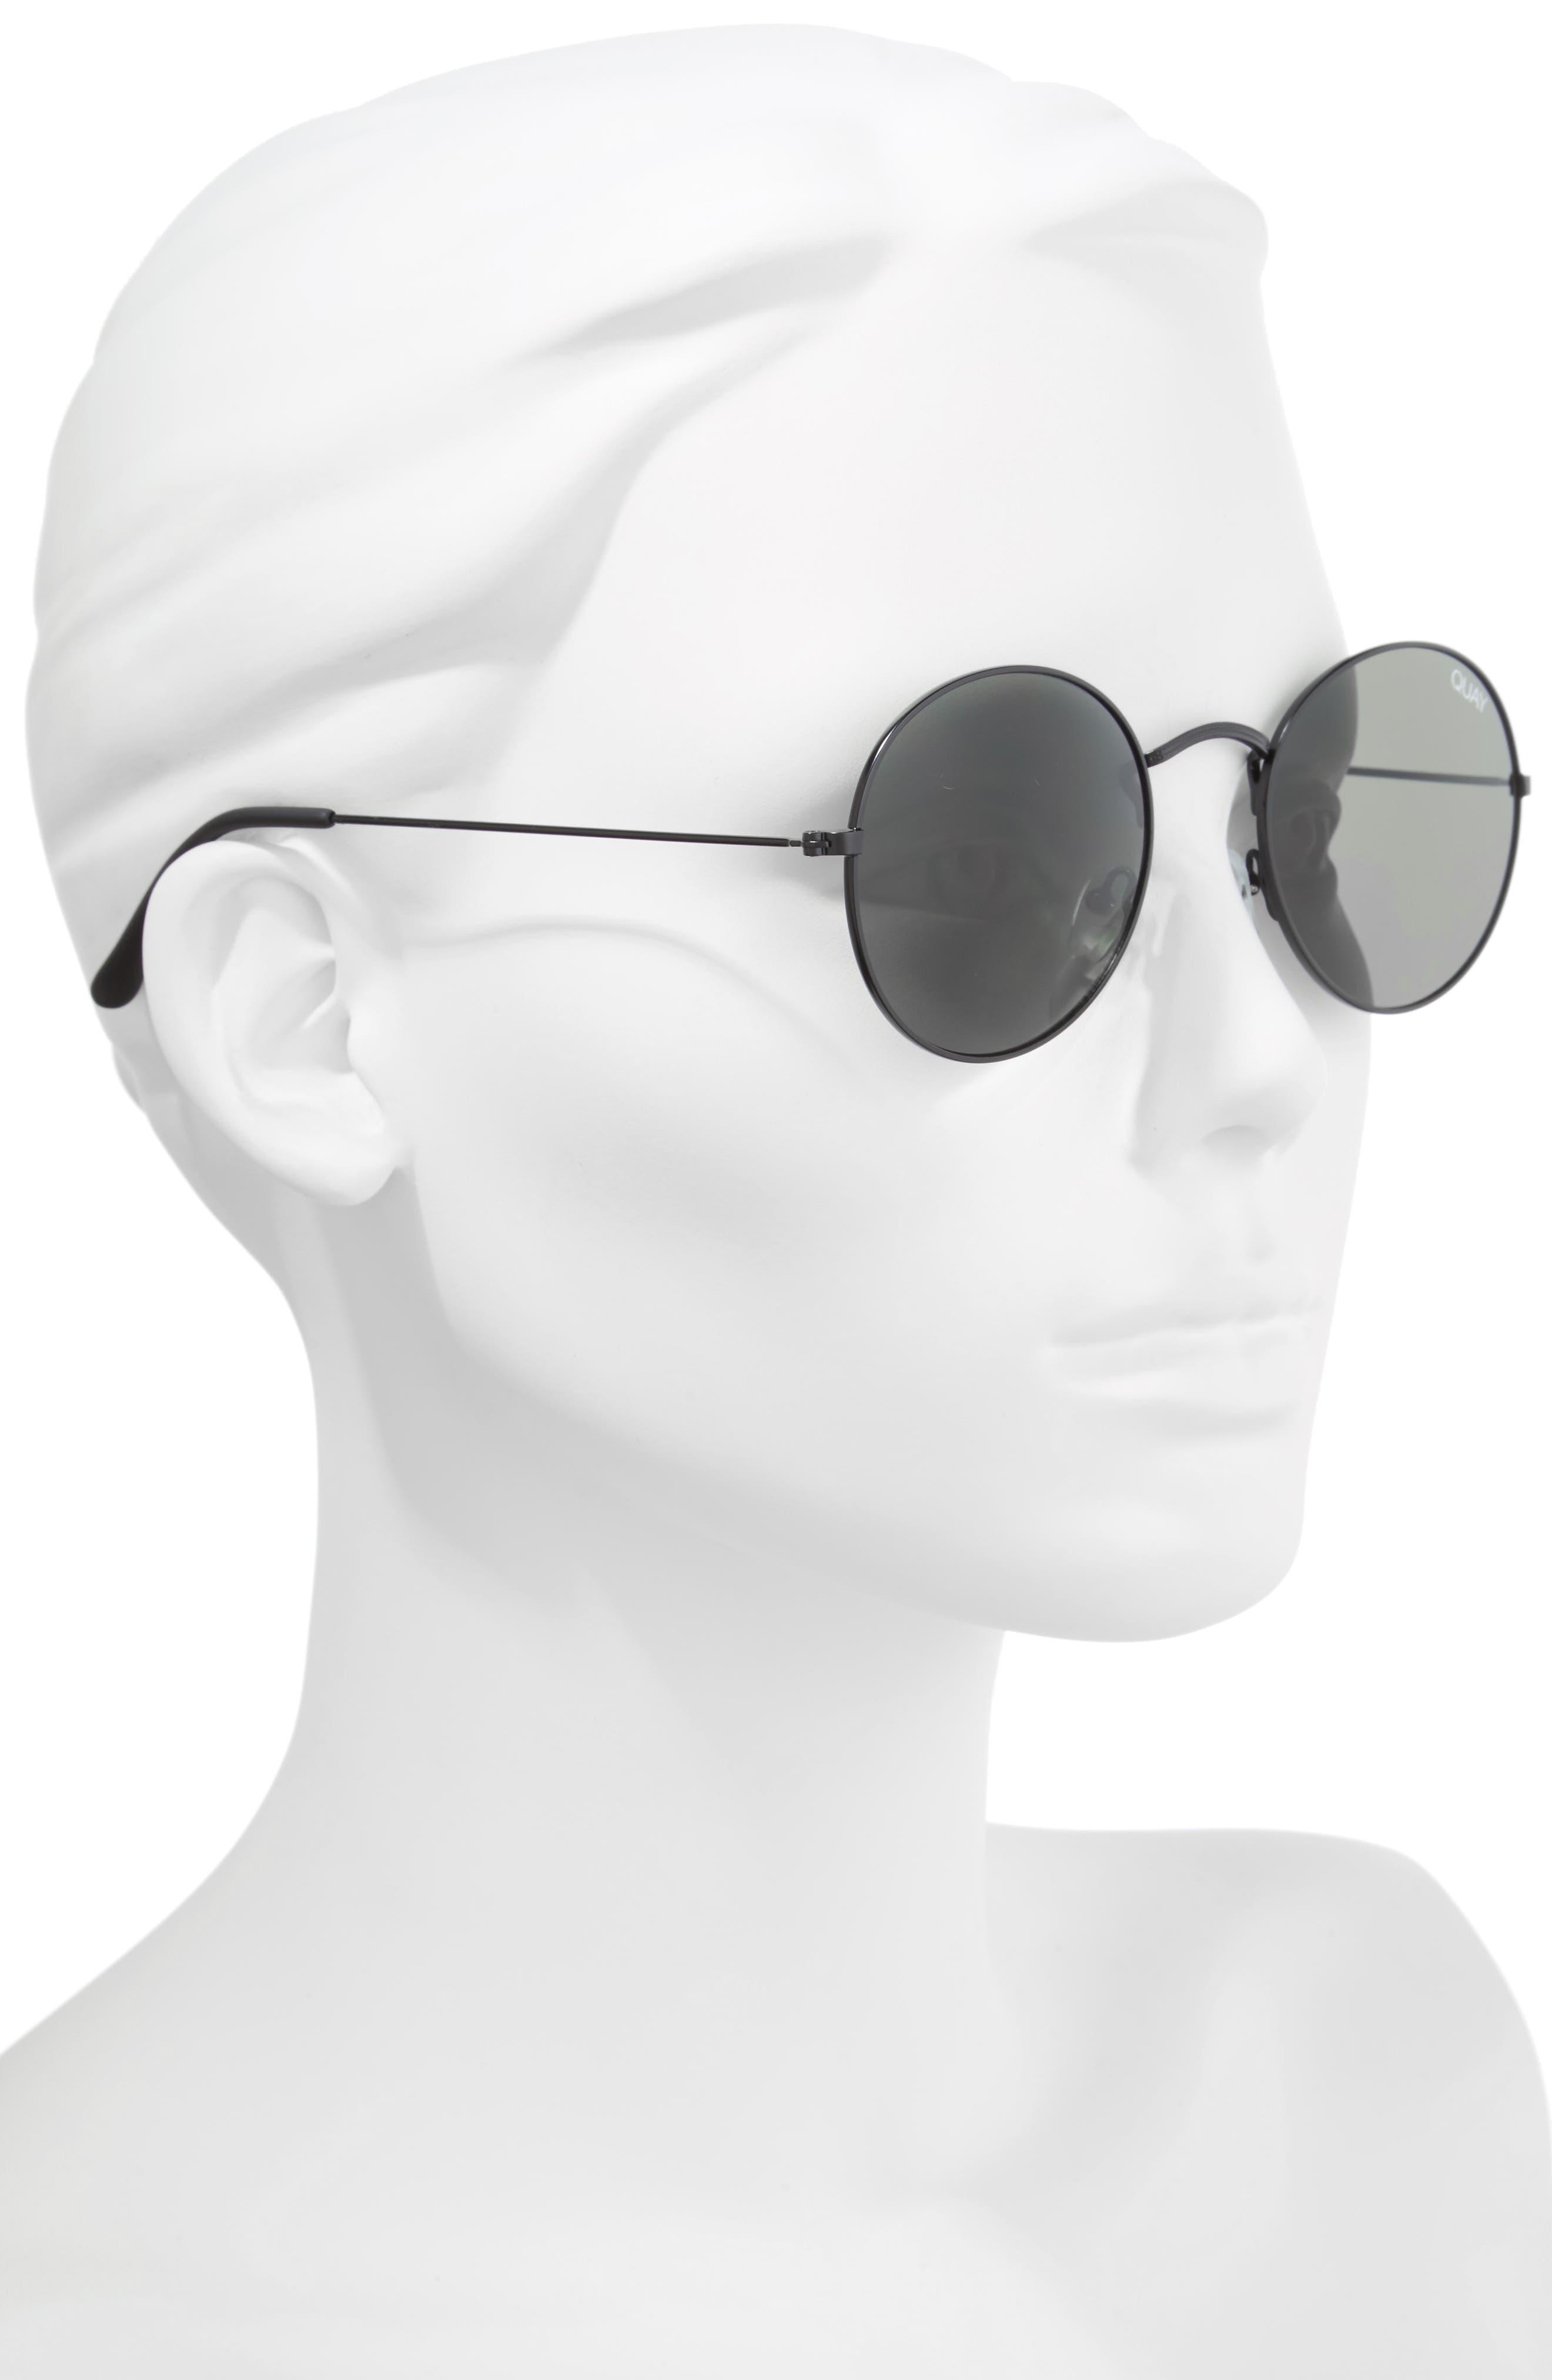 40437c97b7 Contact us. social media. home  contact us. fila sunglasses womens sale